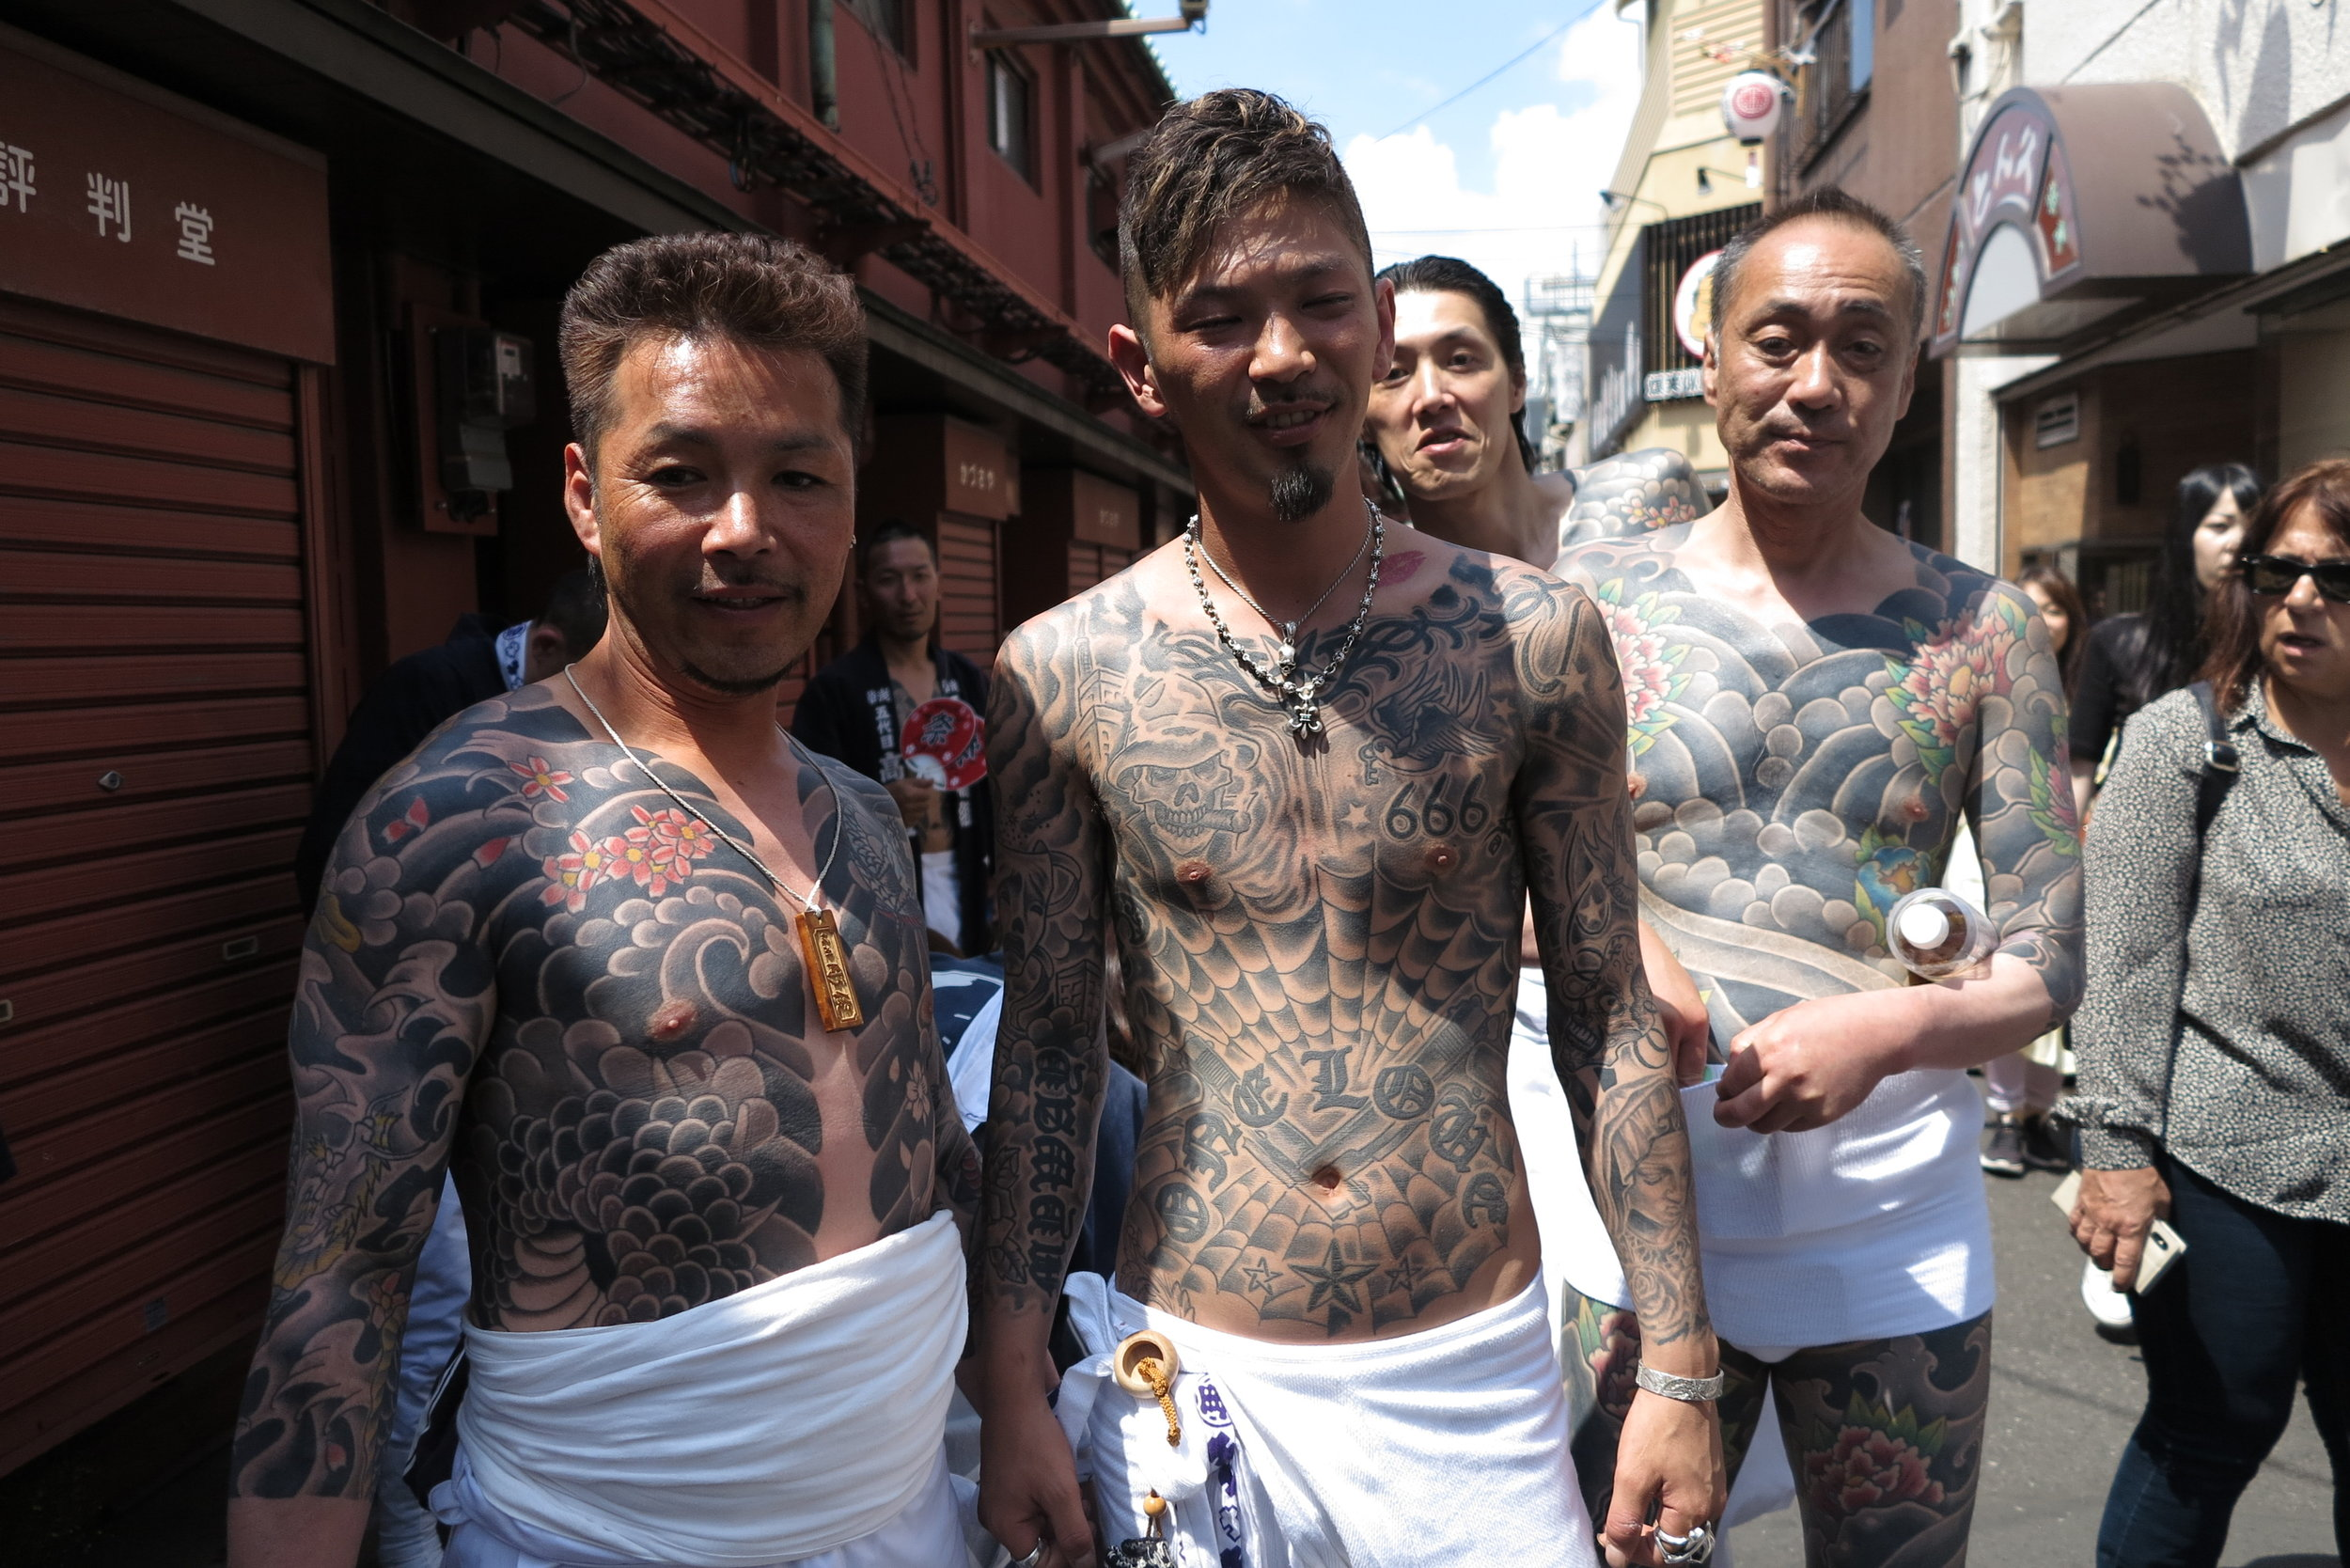 tattoos 2.jpg